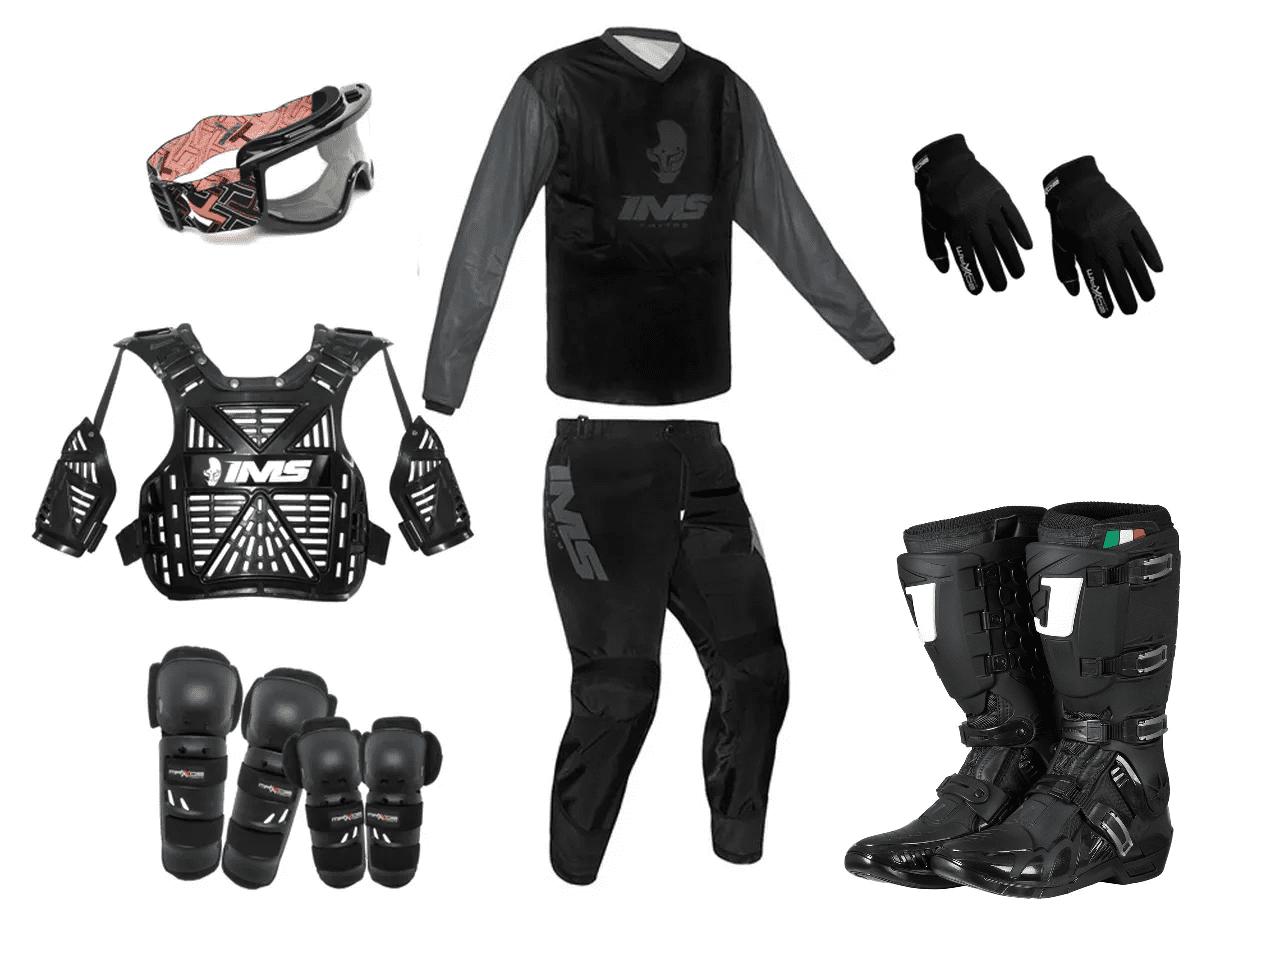 Kit Equipamento Trilha Motocross Enduro Basic - Preto